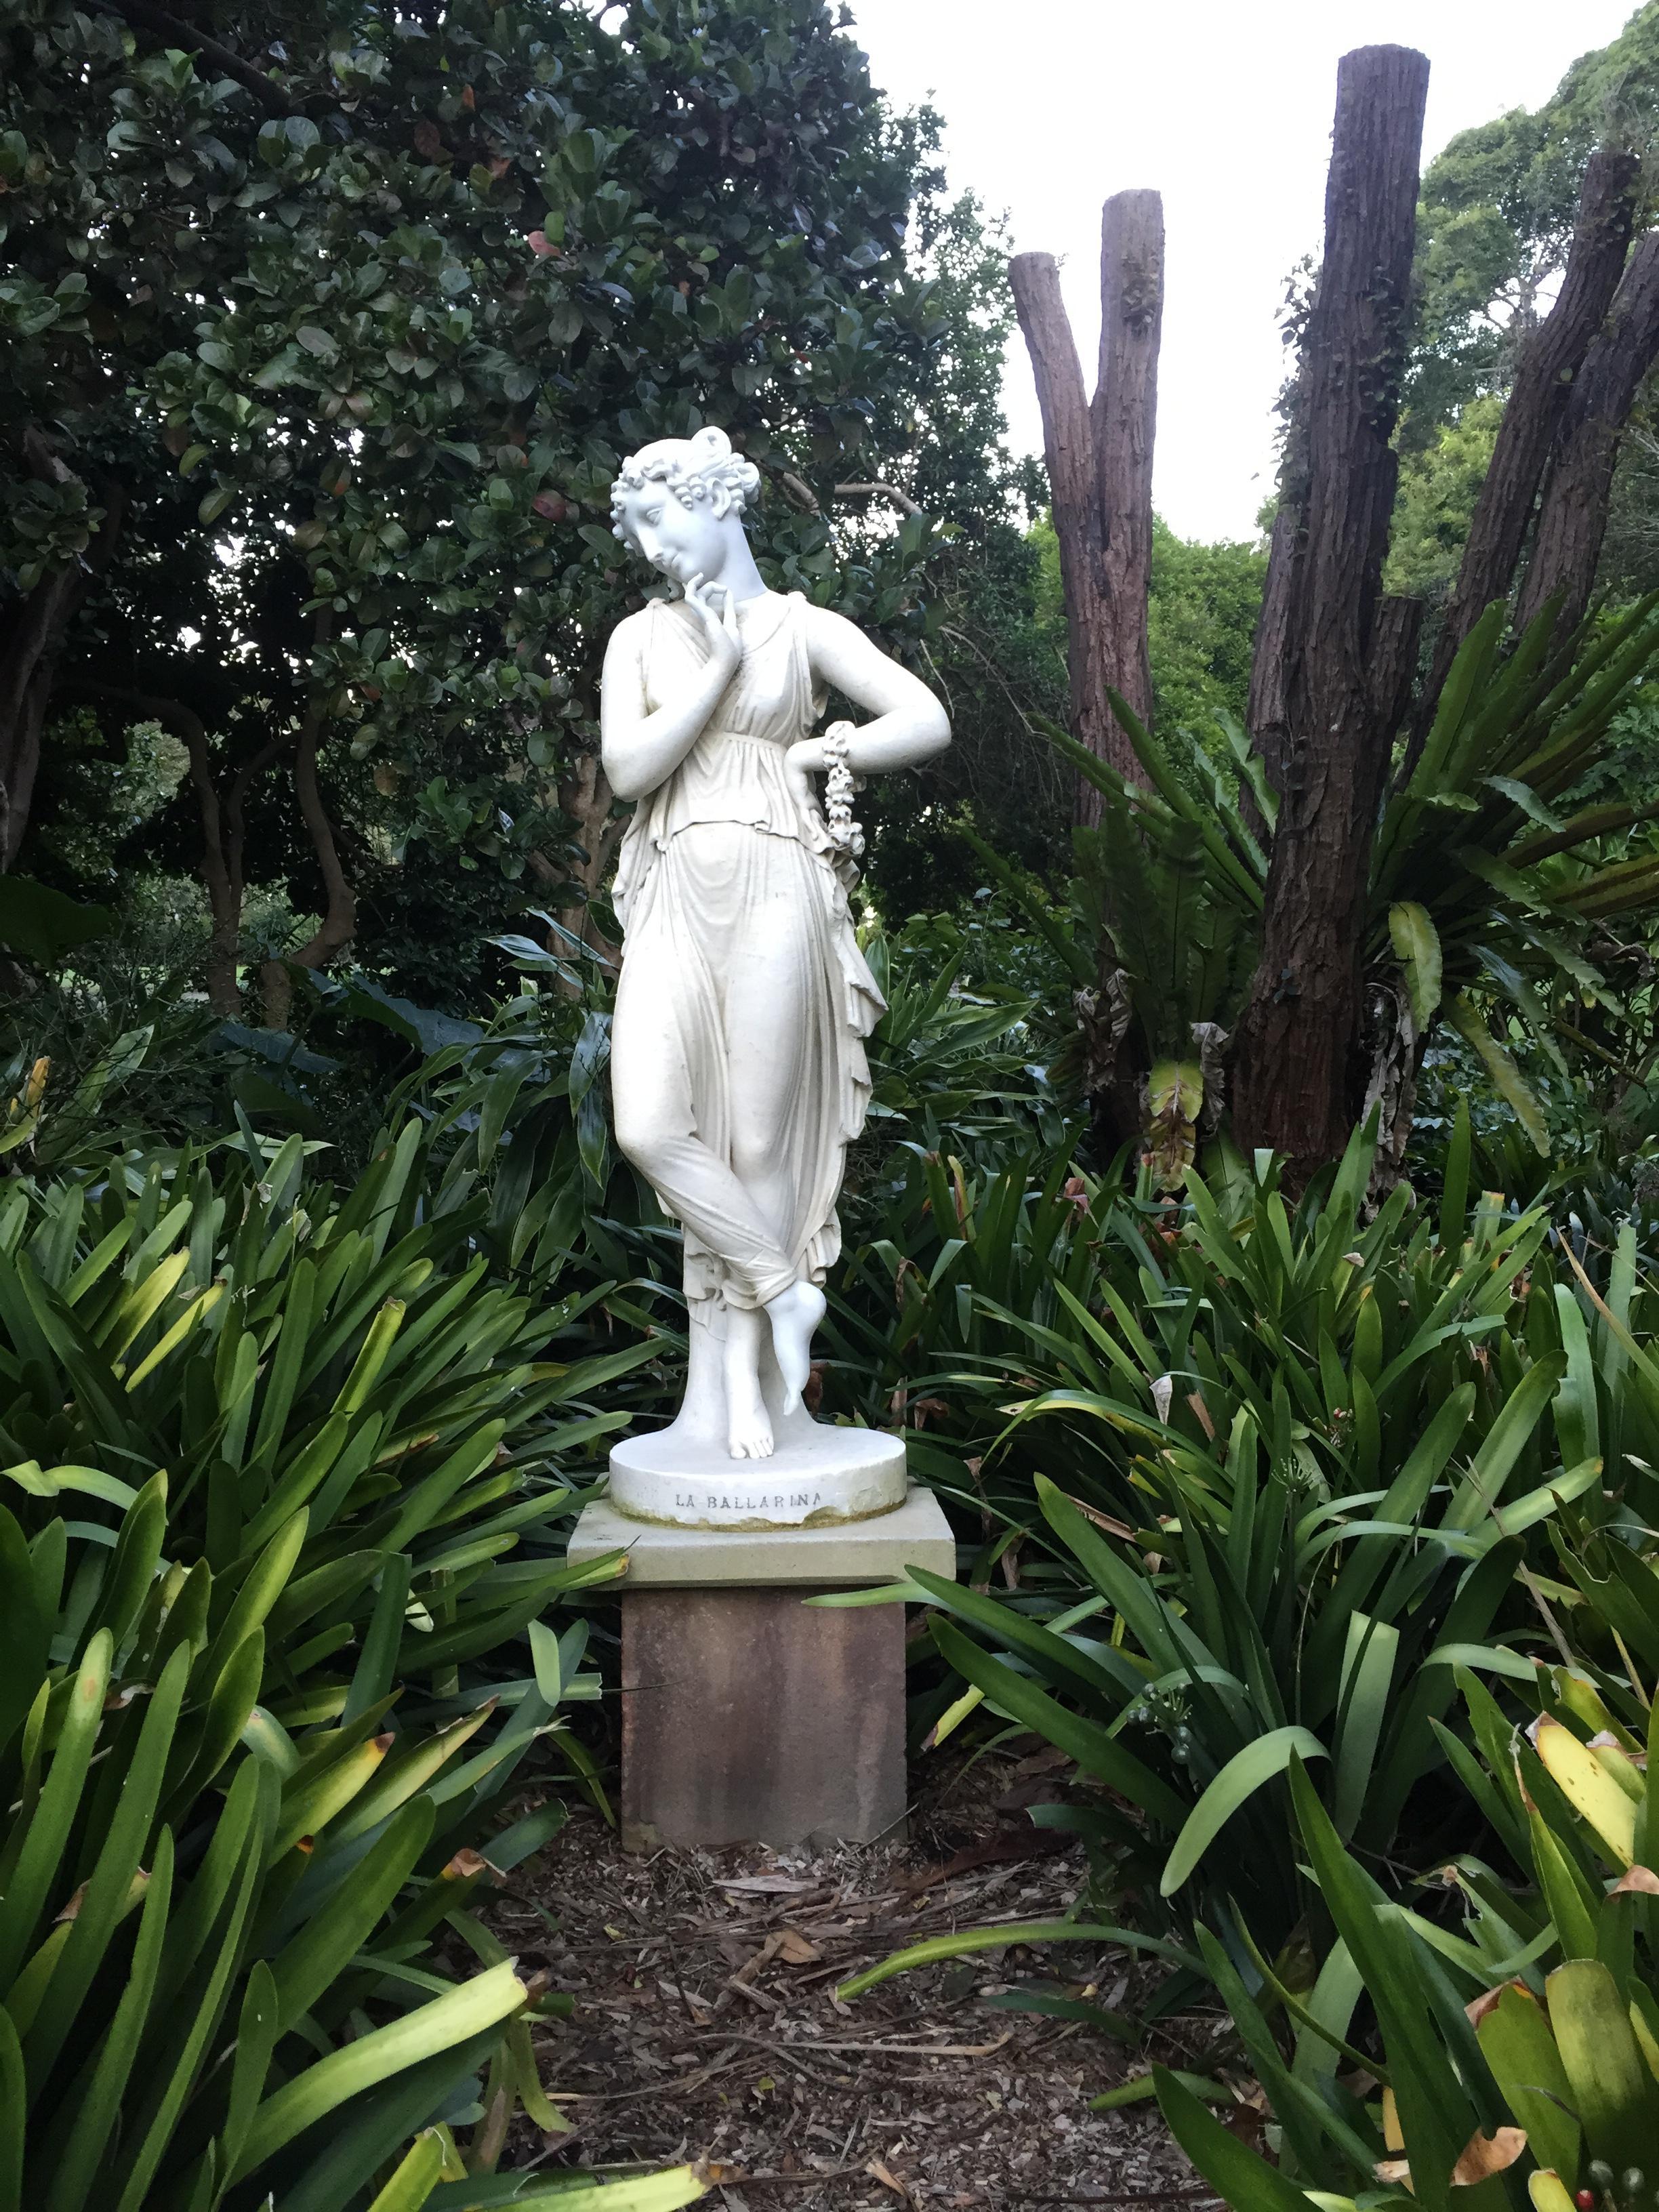 CAPAStudyAbroad_Sydney_Spring015_From_Dana_Lawes_-_Sydney_Botanic_Gardens.jpg